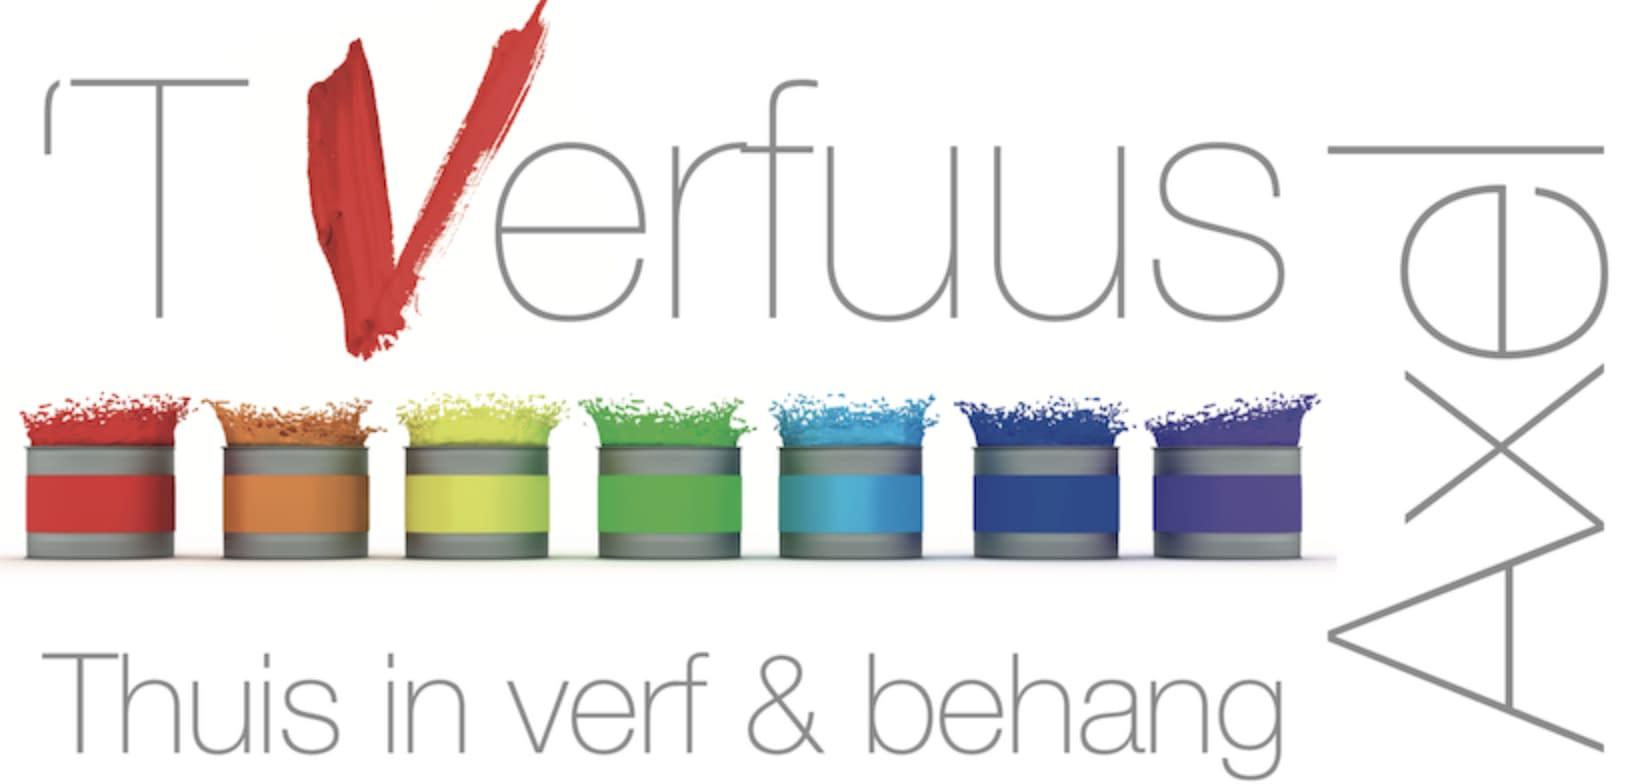 Verfuus logo